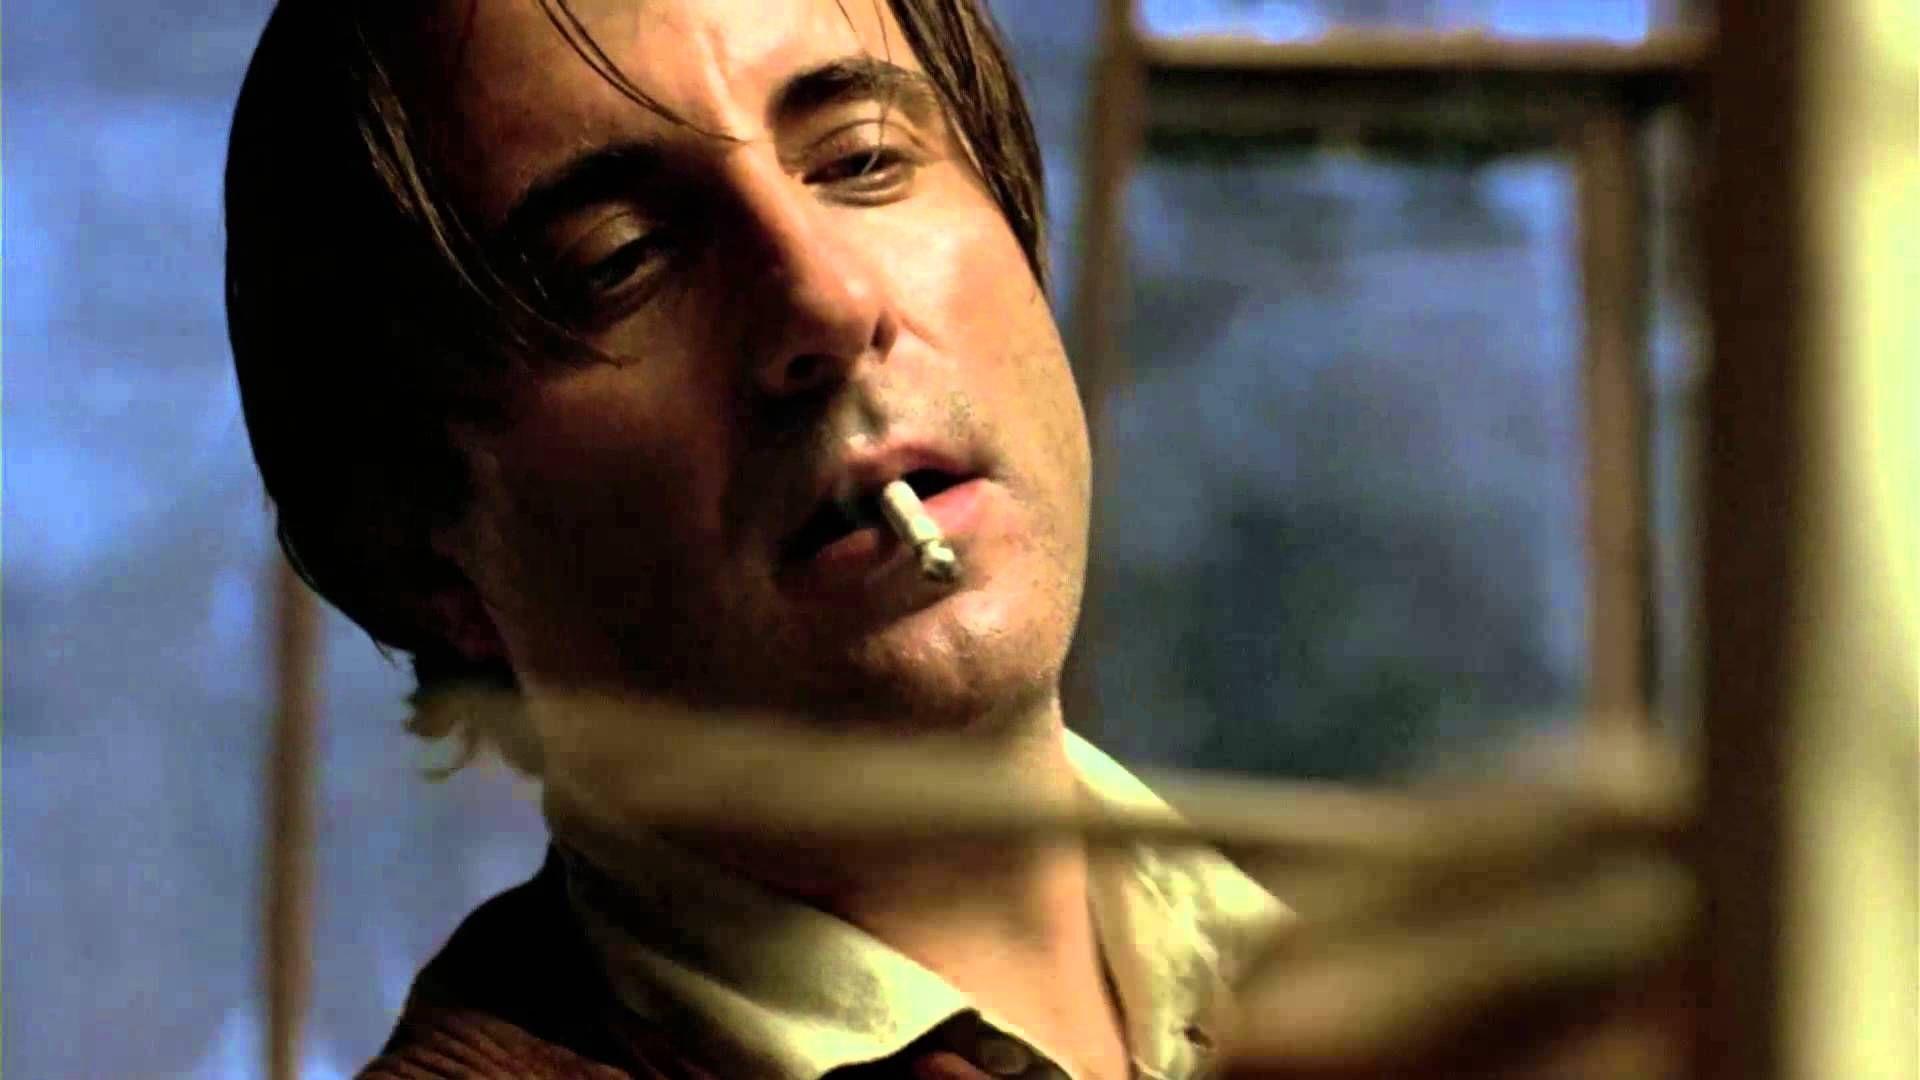 Modigliani 2004 Movie Trailer | Lovers art, Modigliani, Film